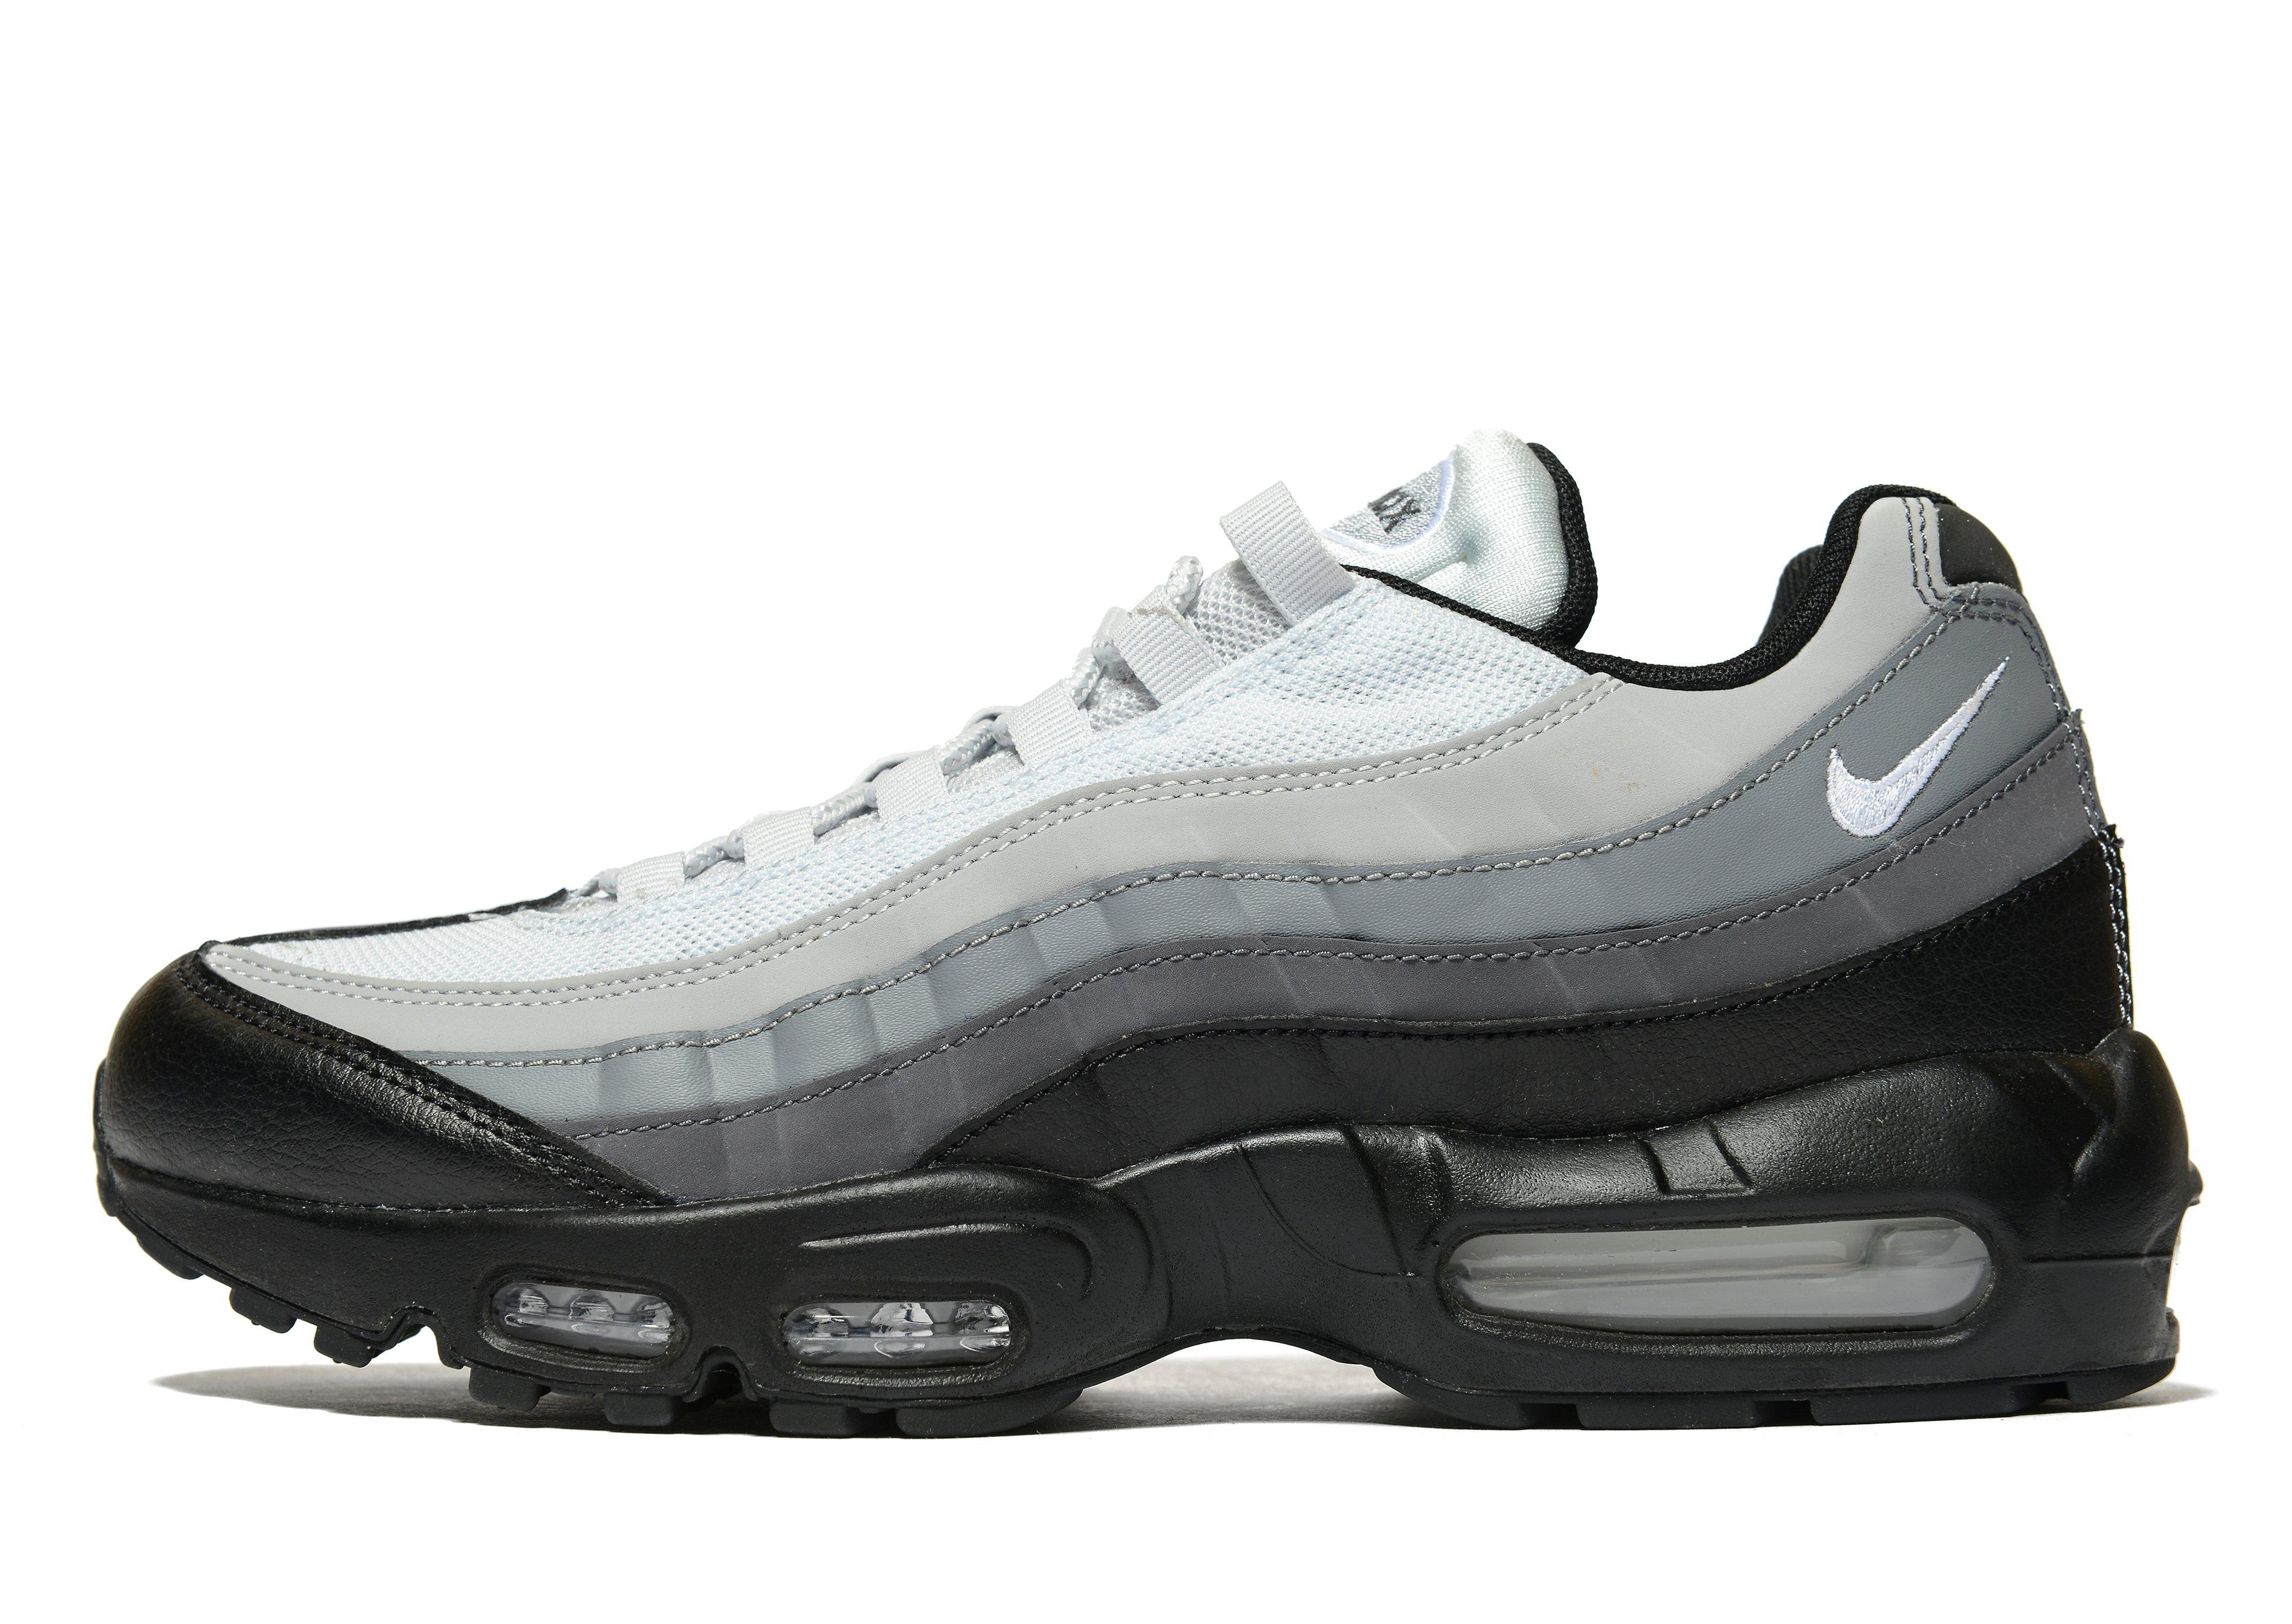 Air Max Shoes Sale Uk